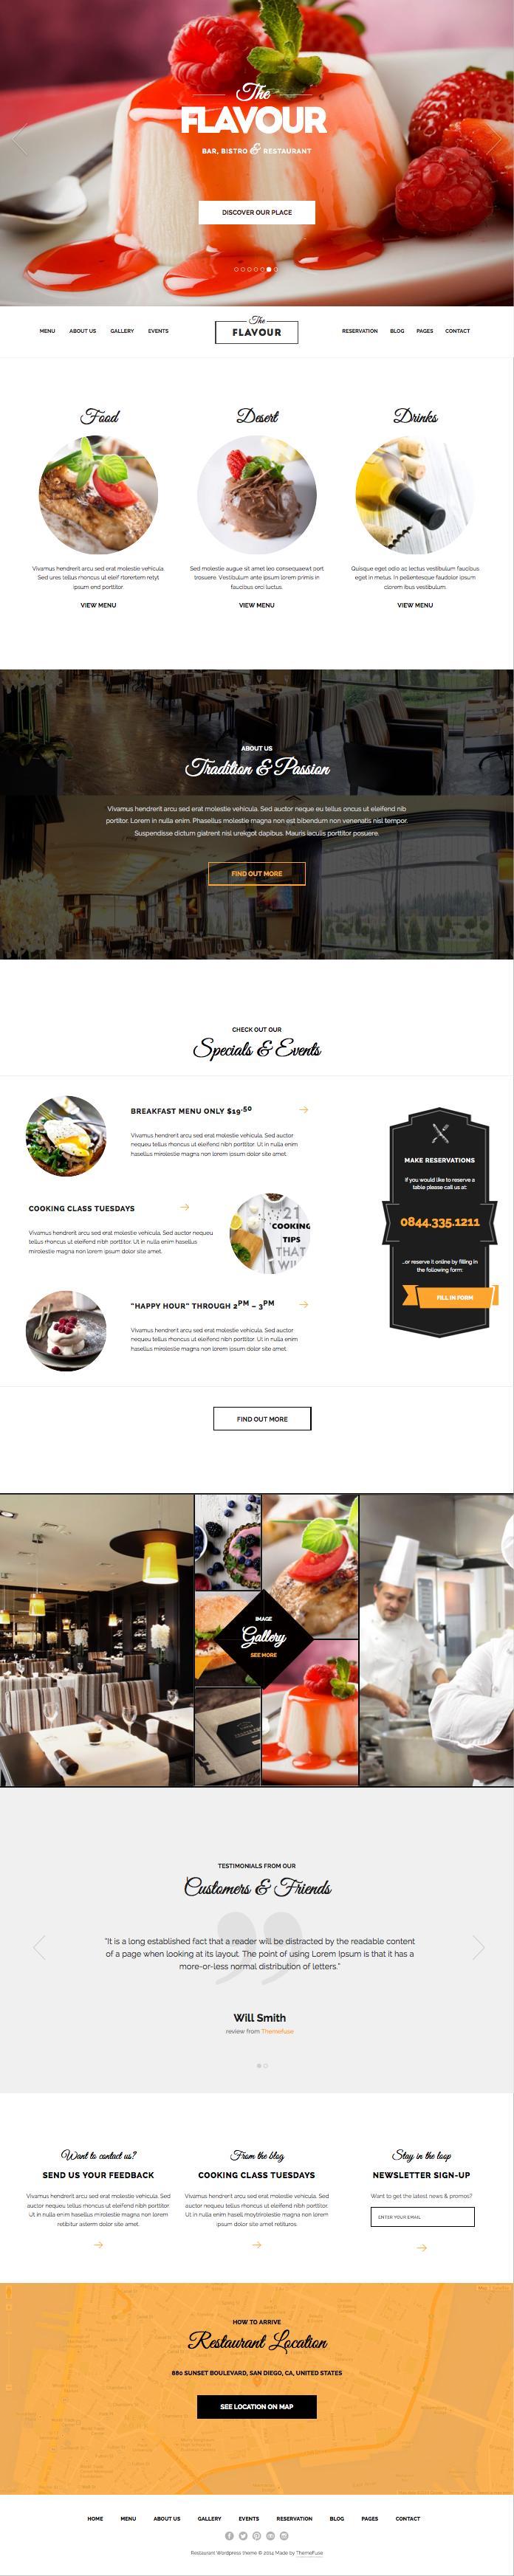 The Flavour WordPress Modern Restaurant Theme